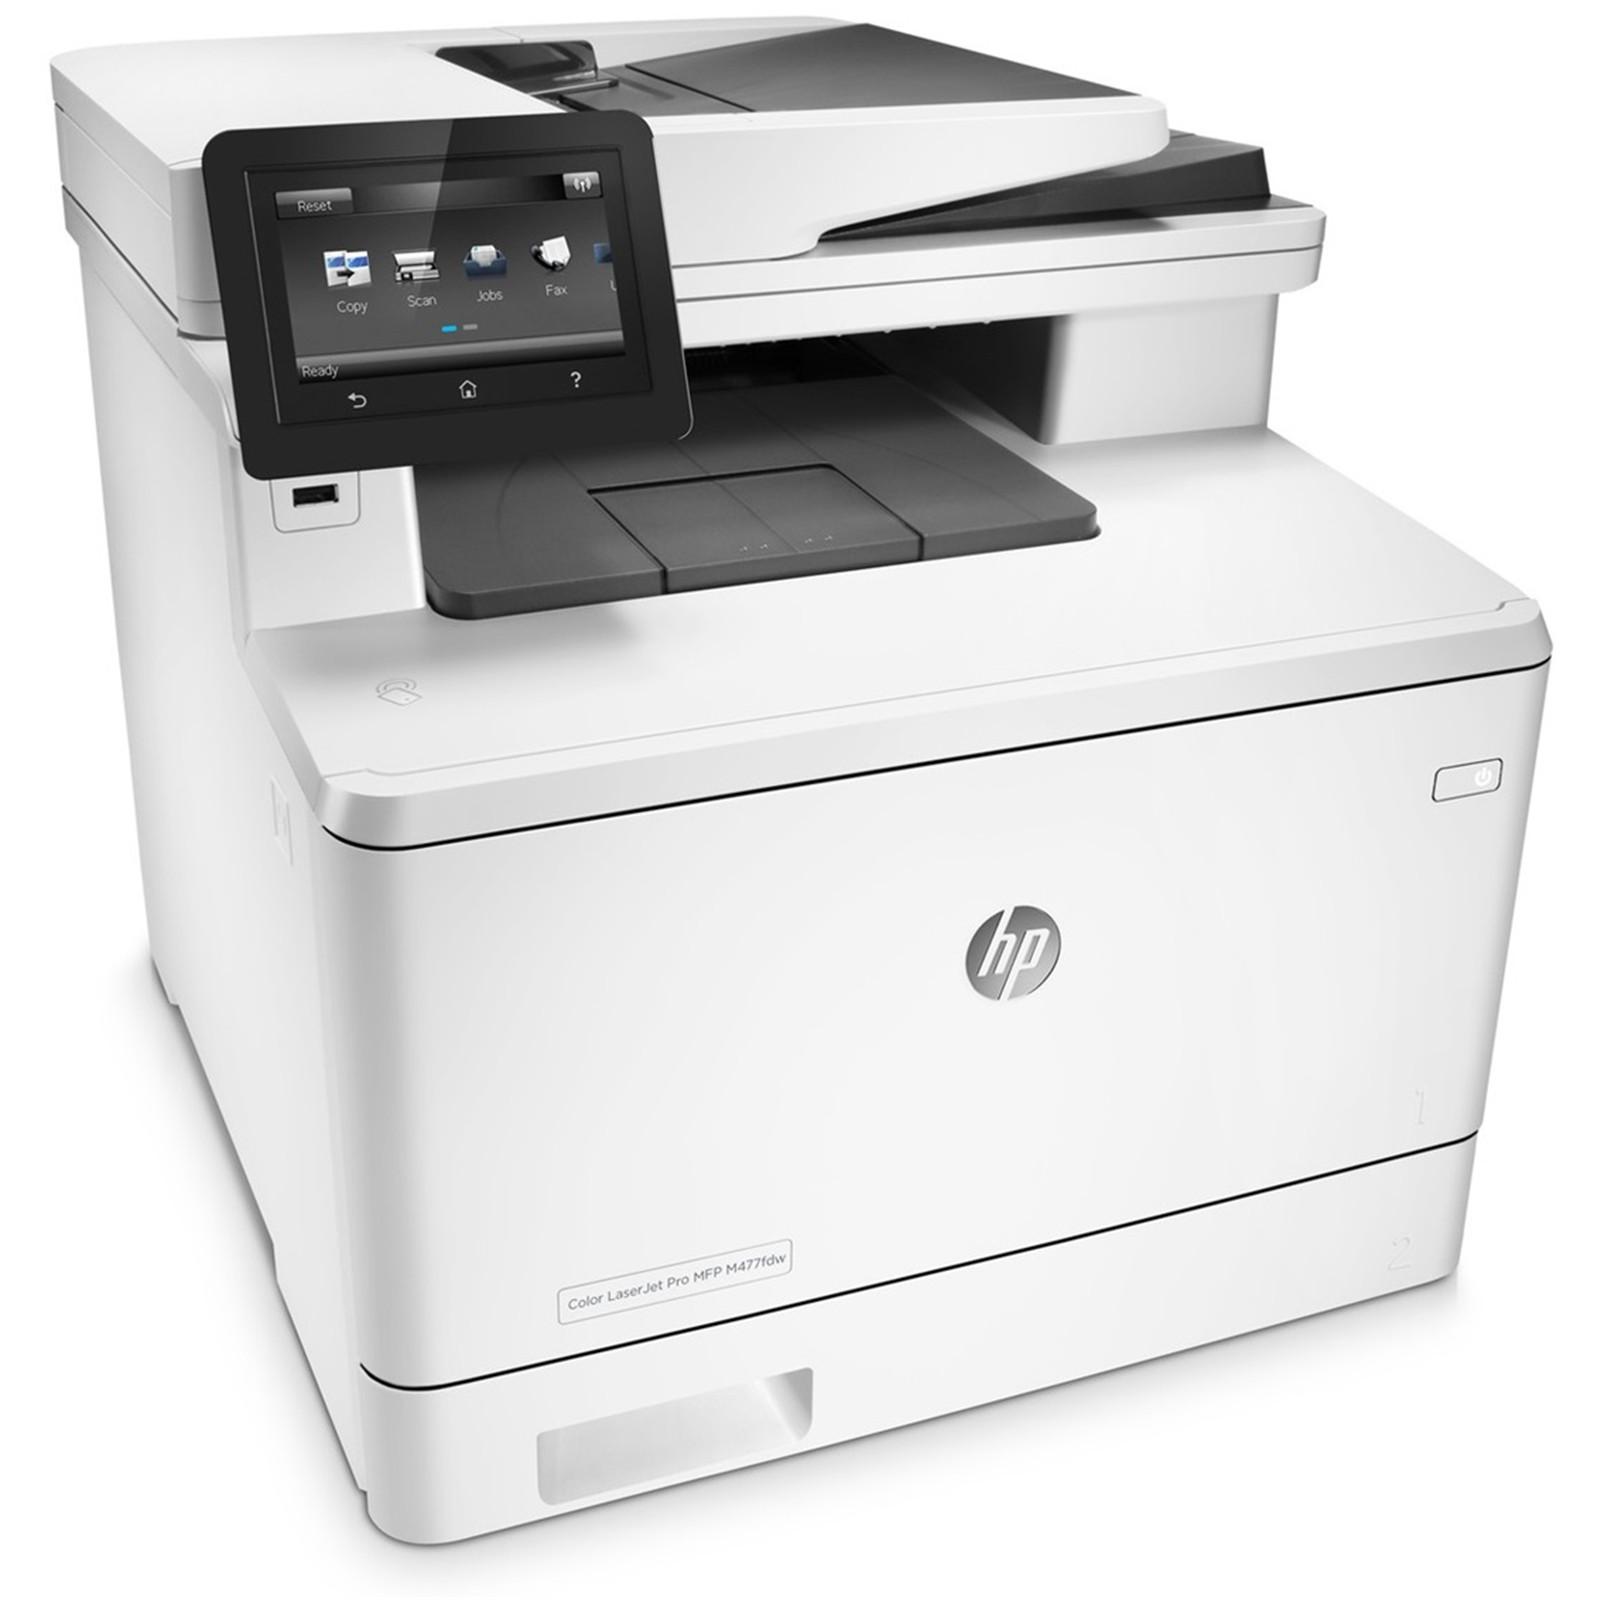 Buy the HP Laserjet Pro 400 M477fdw Colour laser MFP Print